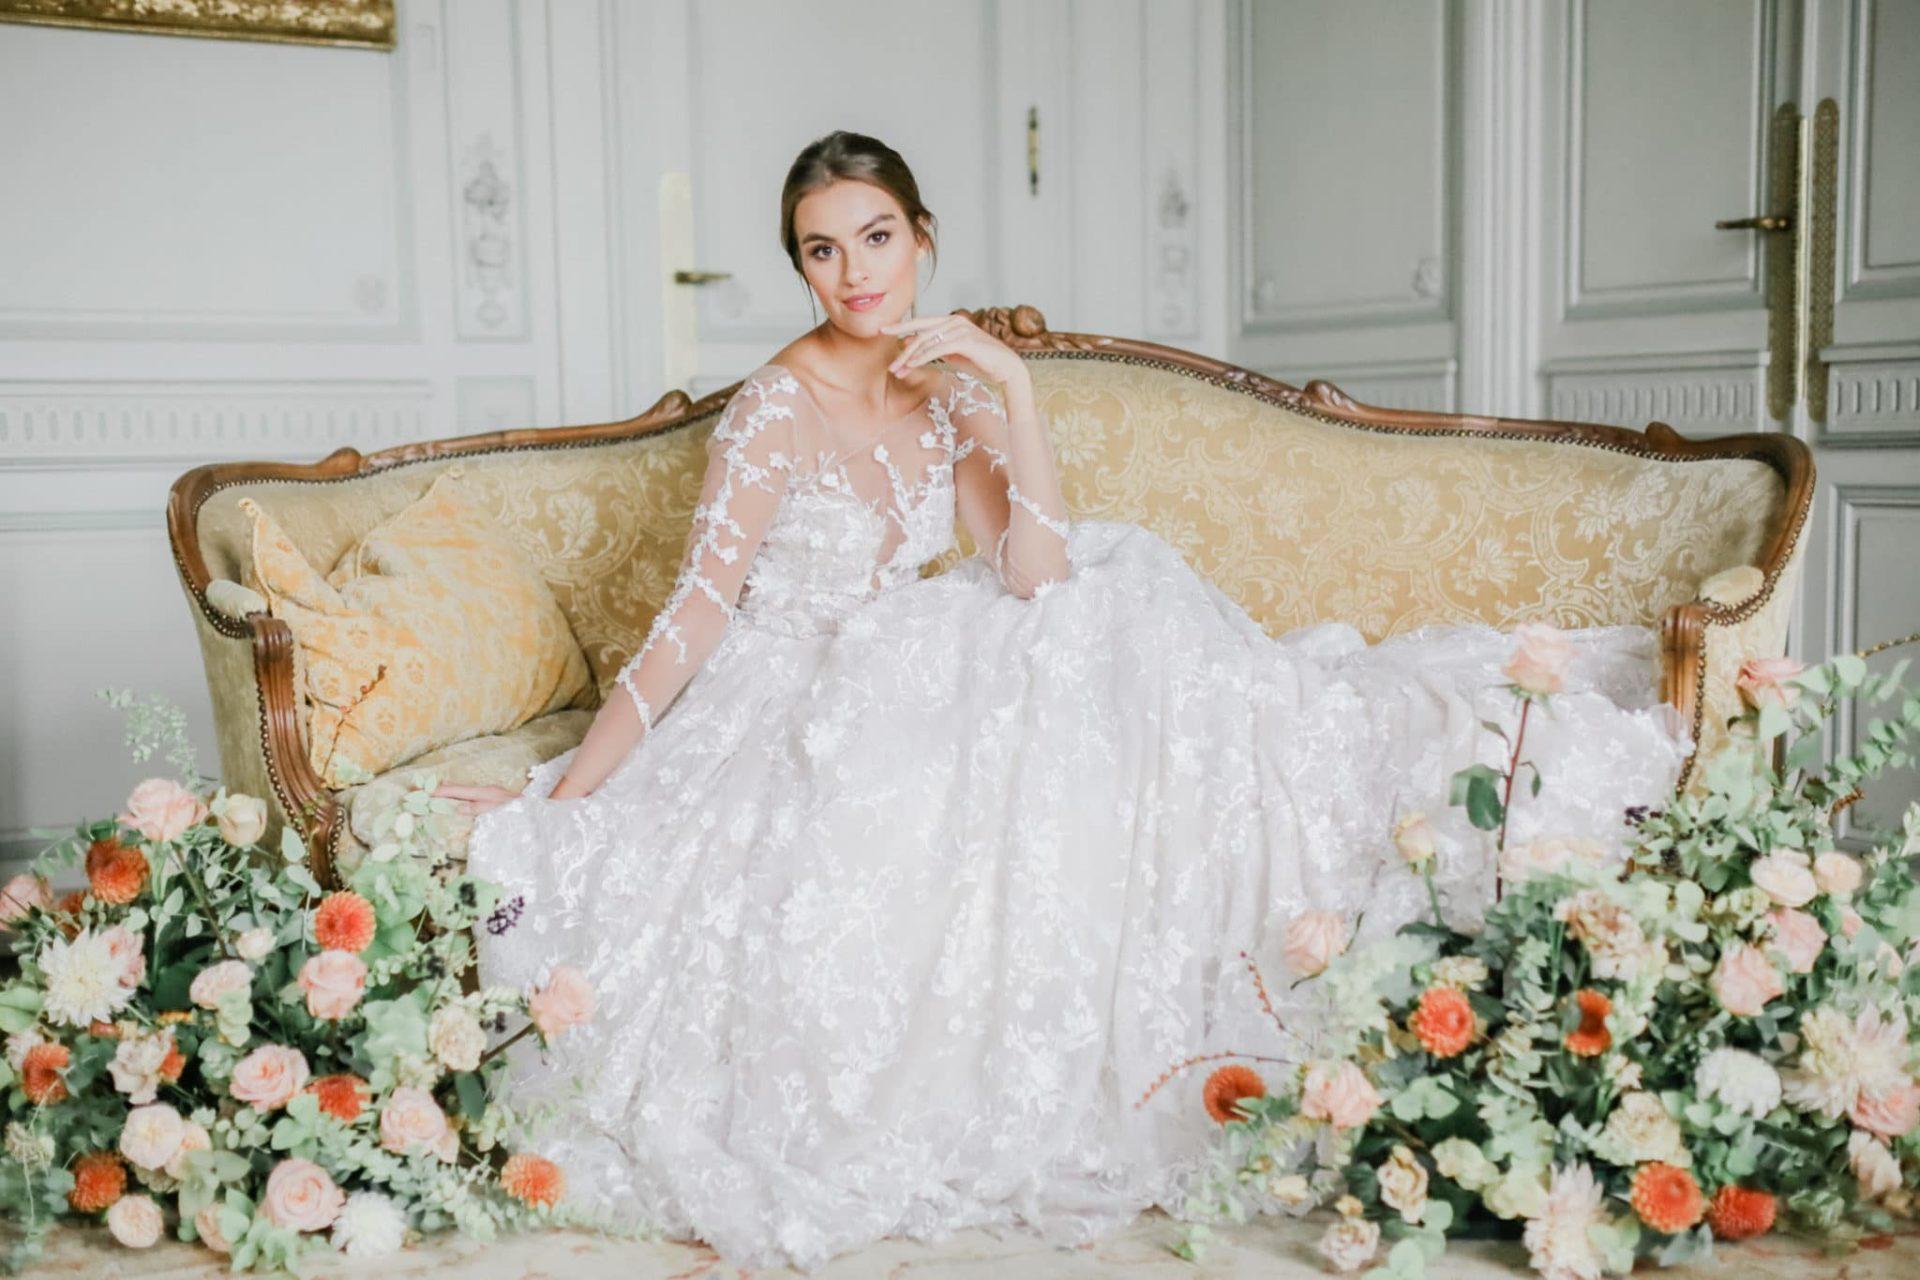 Organsa Wedding Planner Paris camy Duong